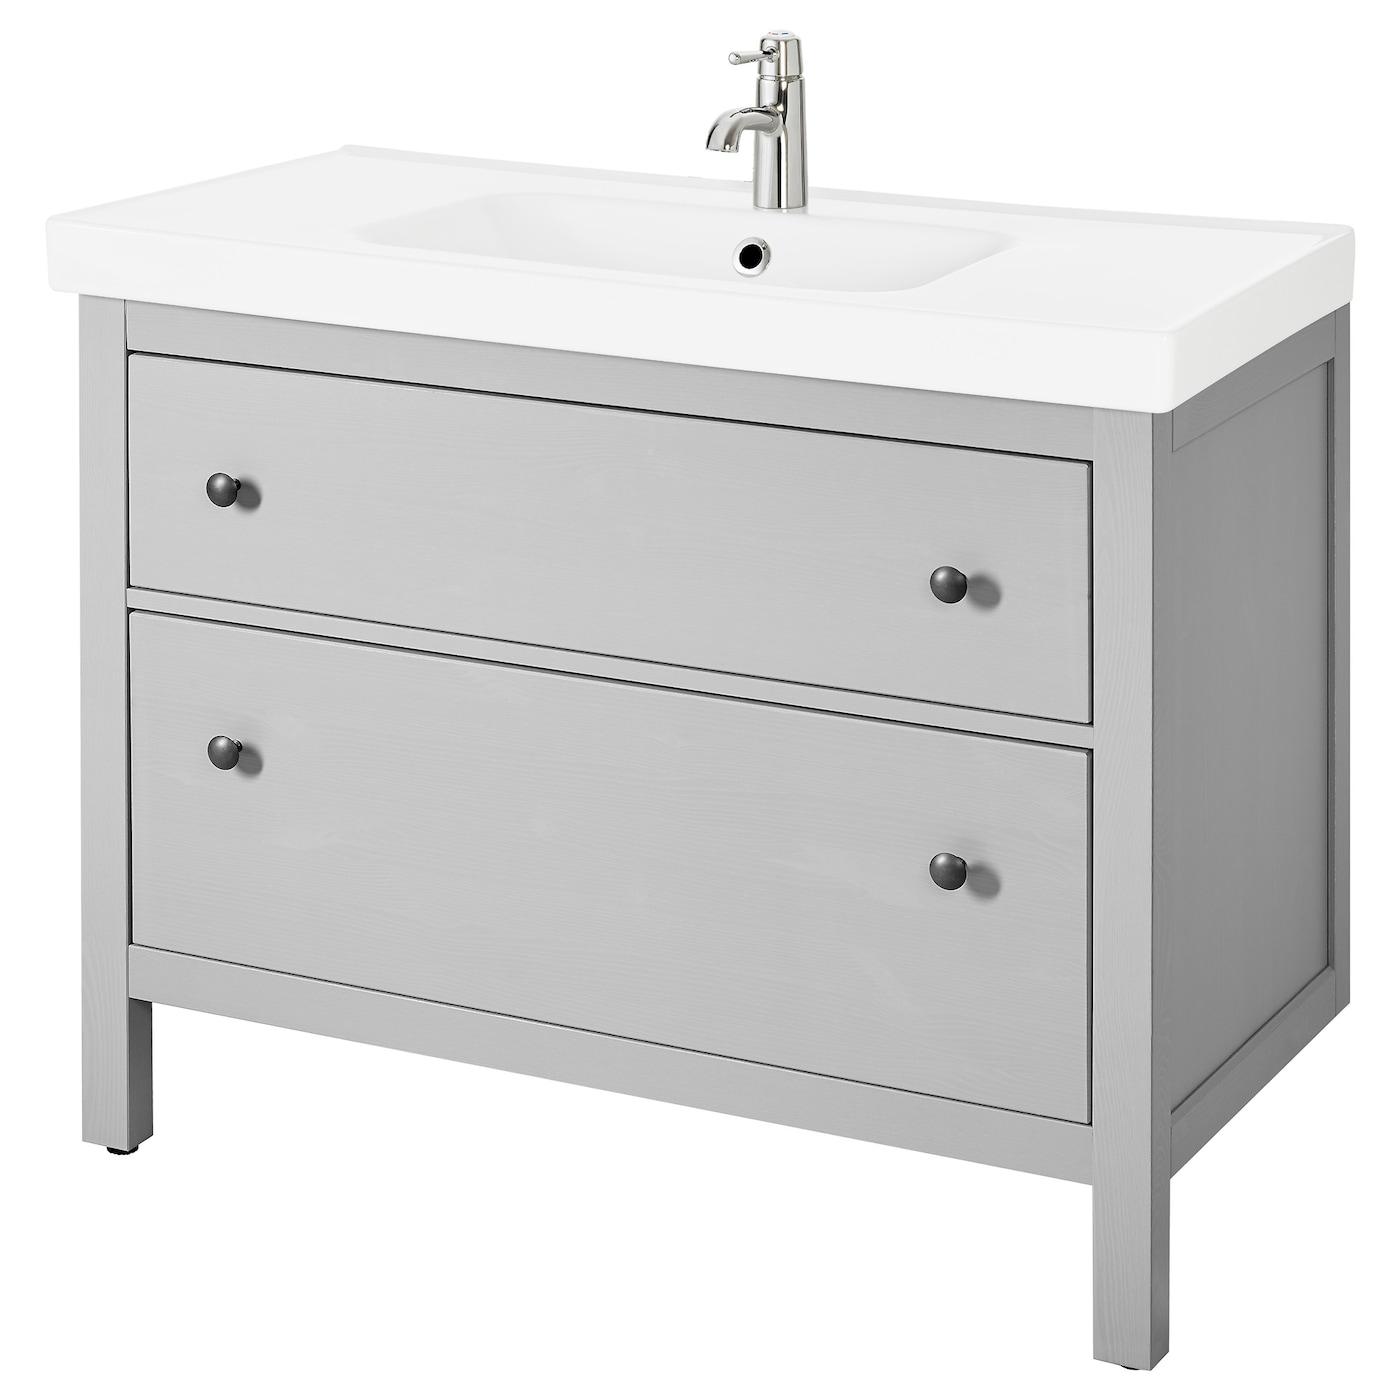 Odensvik hemnes armario lavabo 2 cajones gris 103 x 49 x - Armario lavabo ikea ...